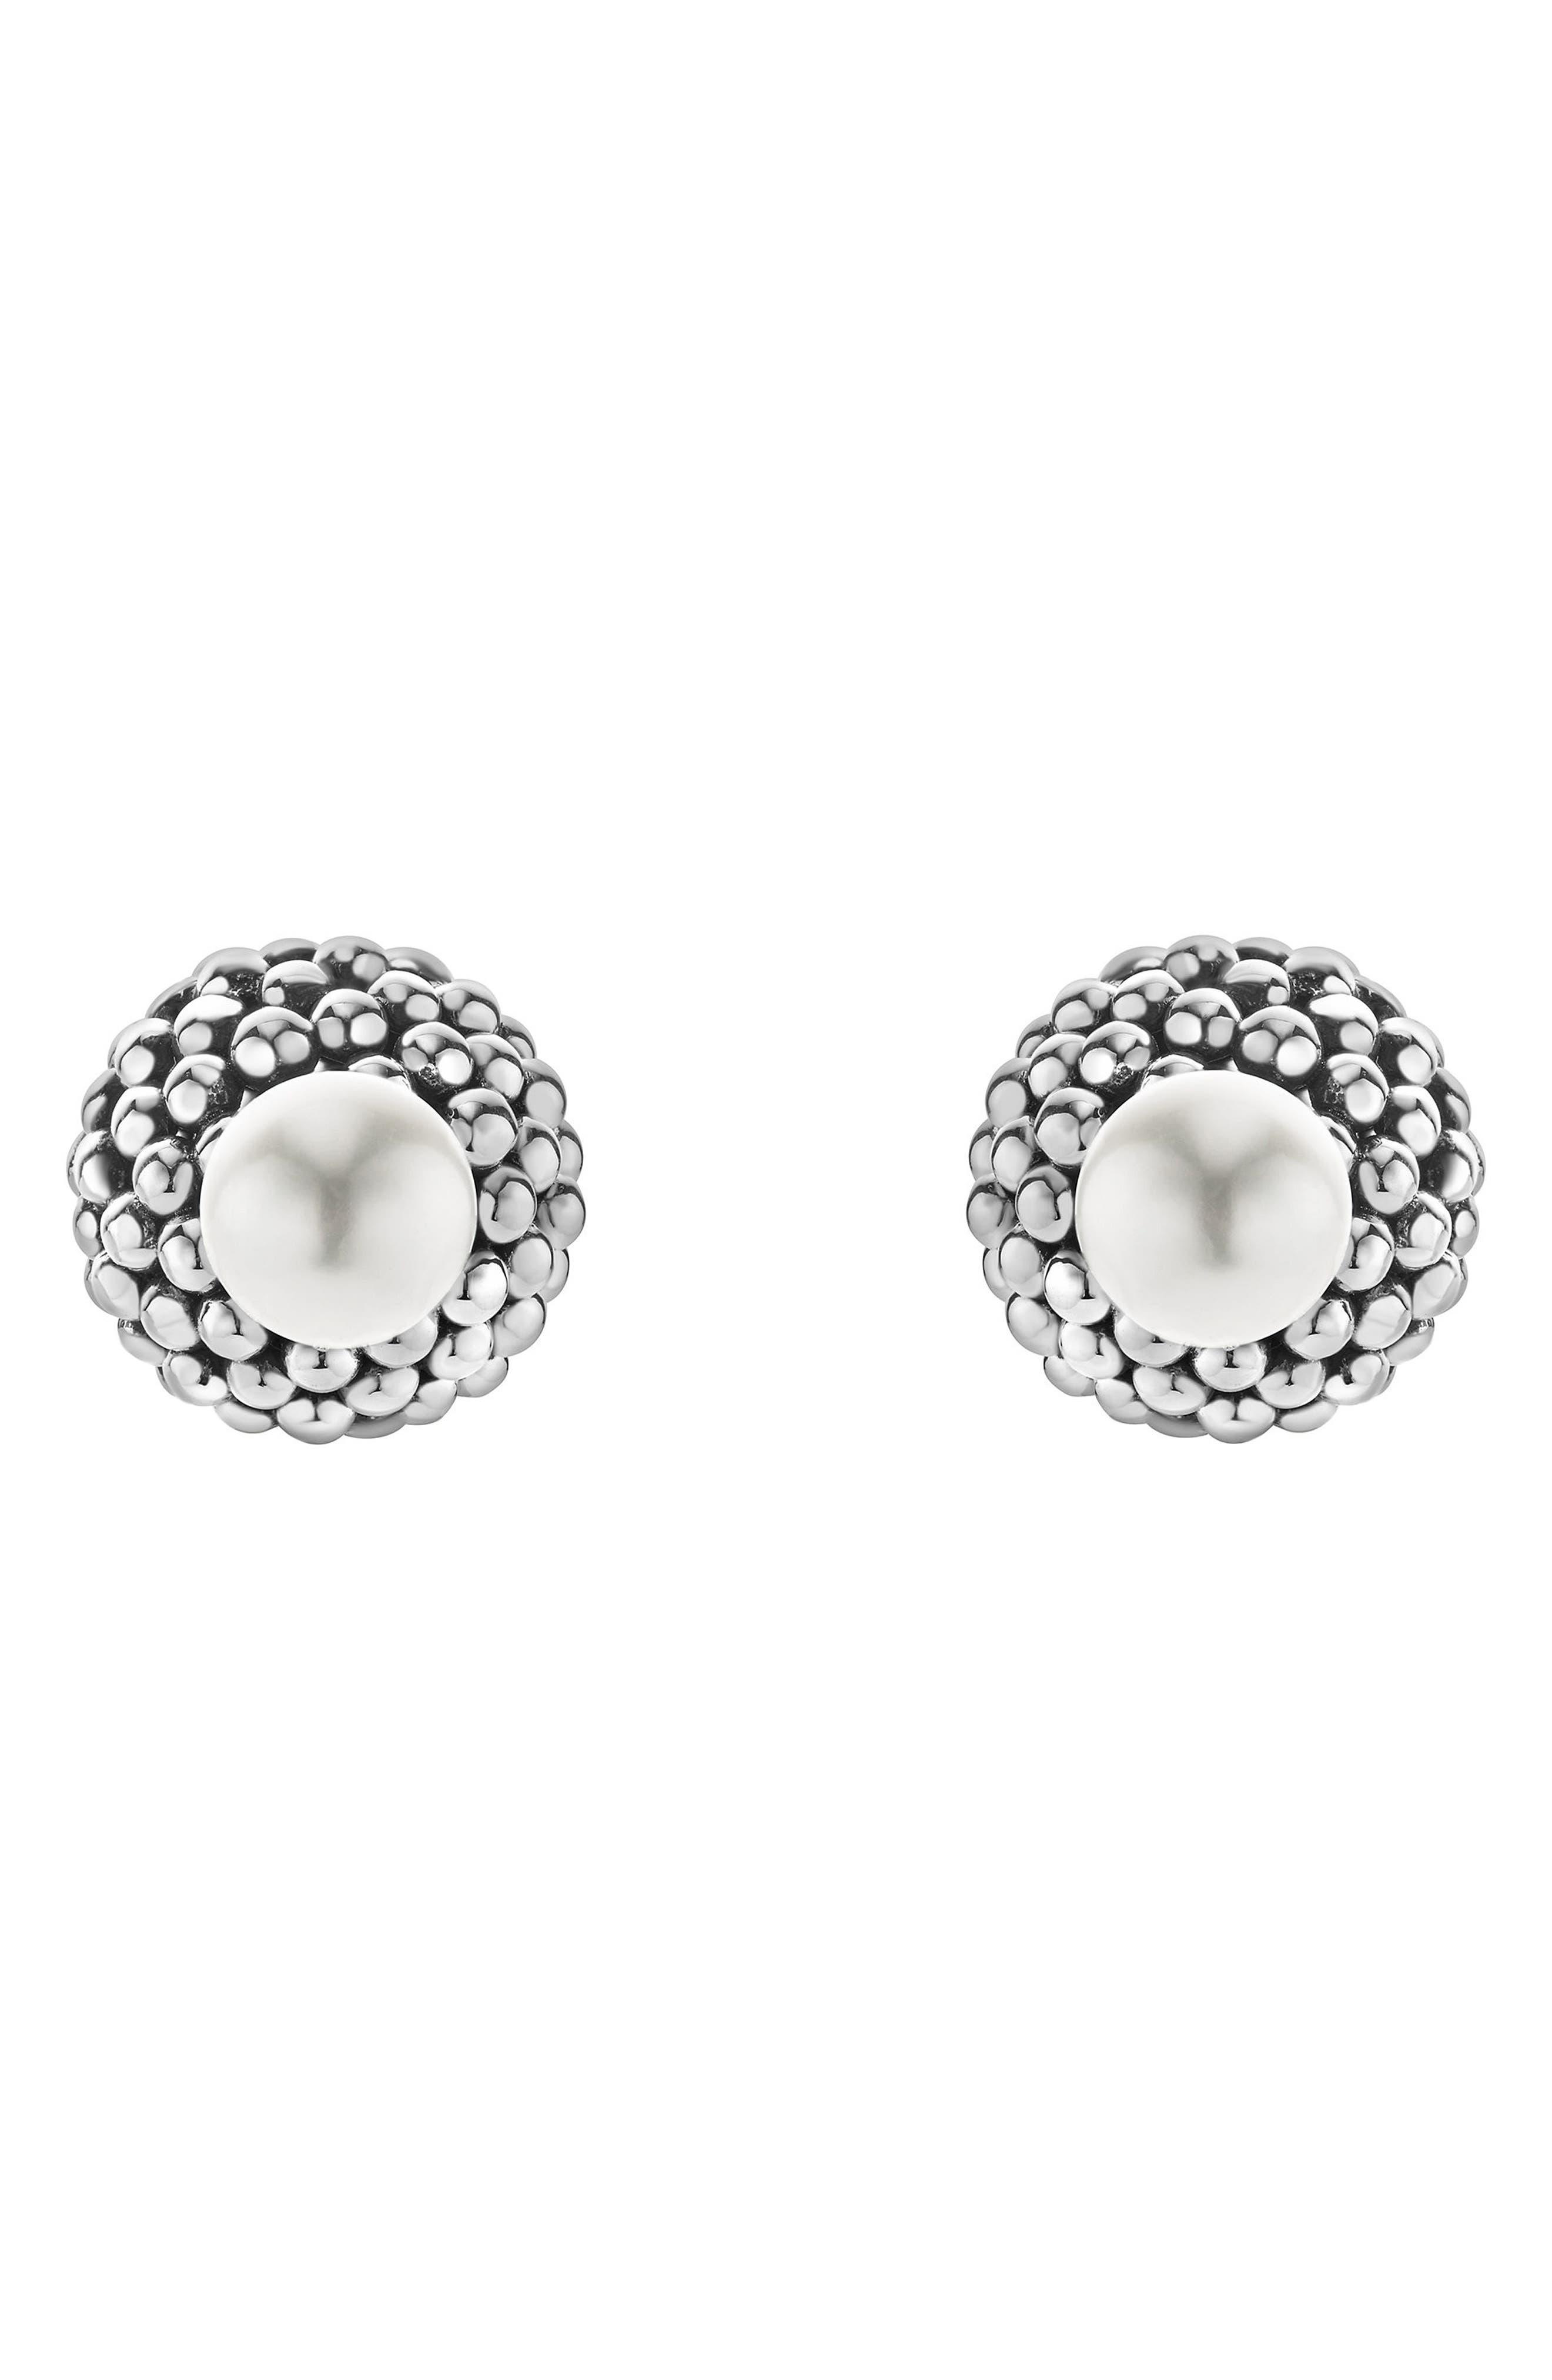 LAGOS Caviar & Pearl Stud Earrings